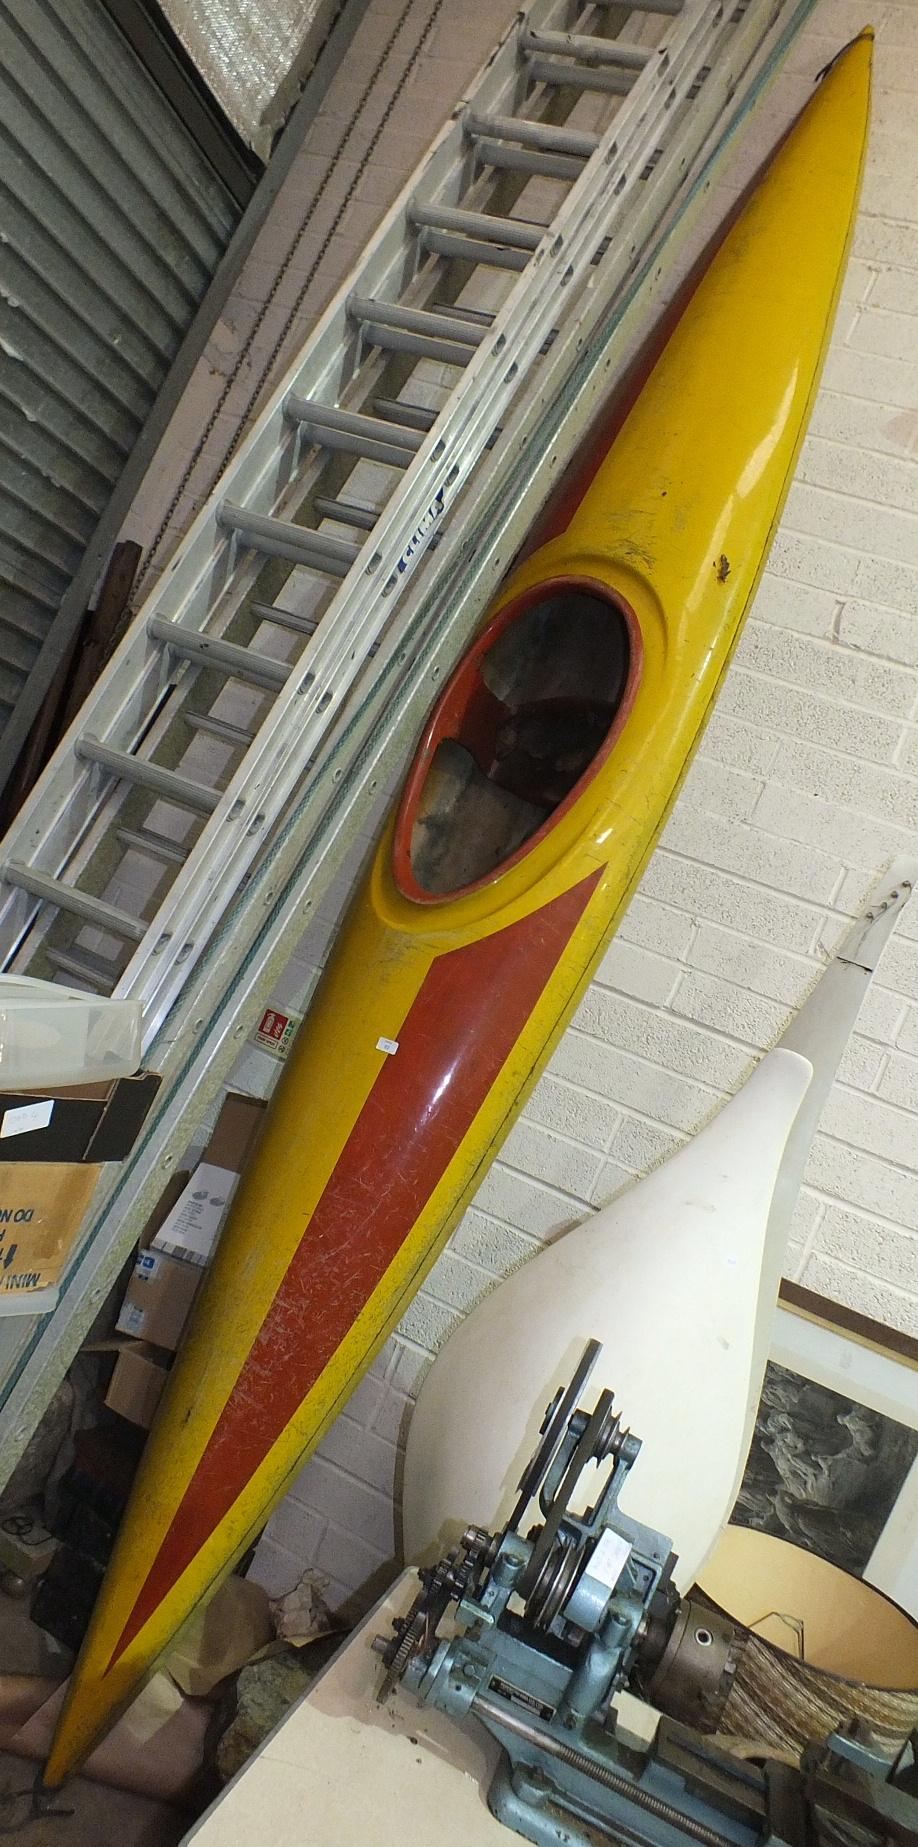 Lot 52 - A fibreglass canoe.